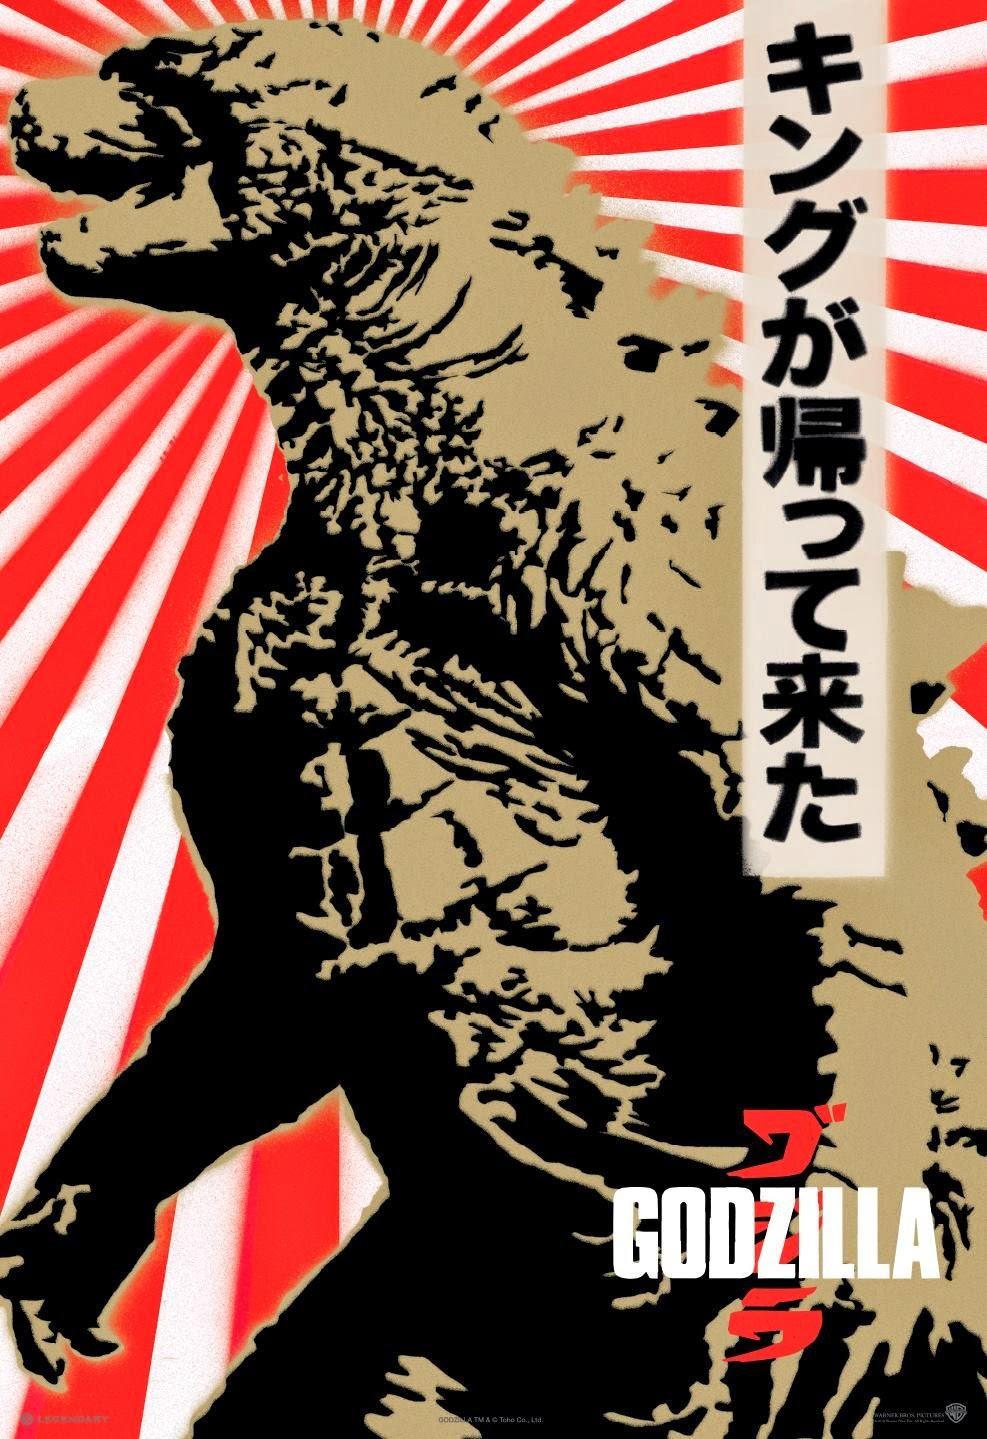 ¡Cartelicos!: Godzilla